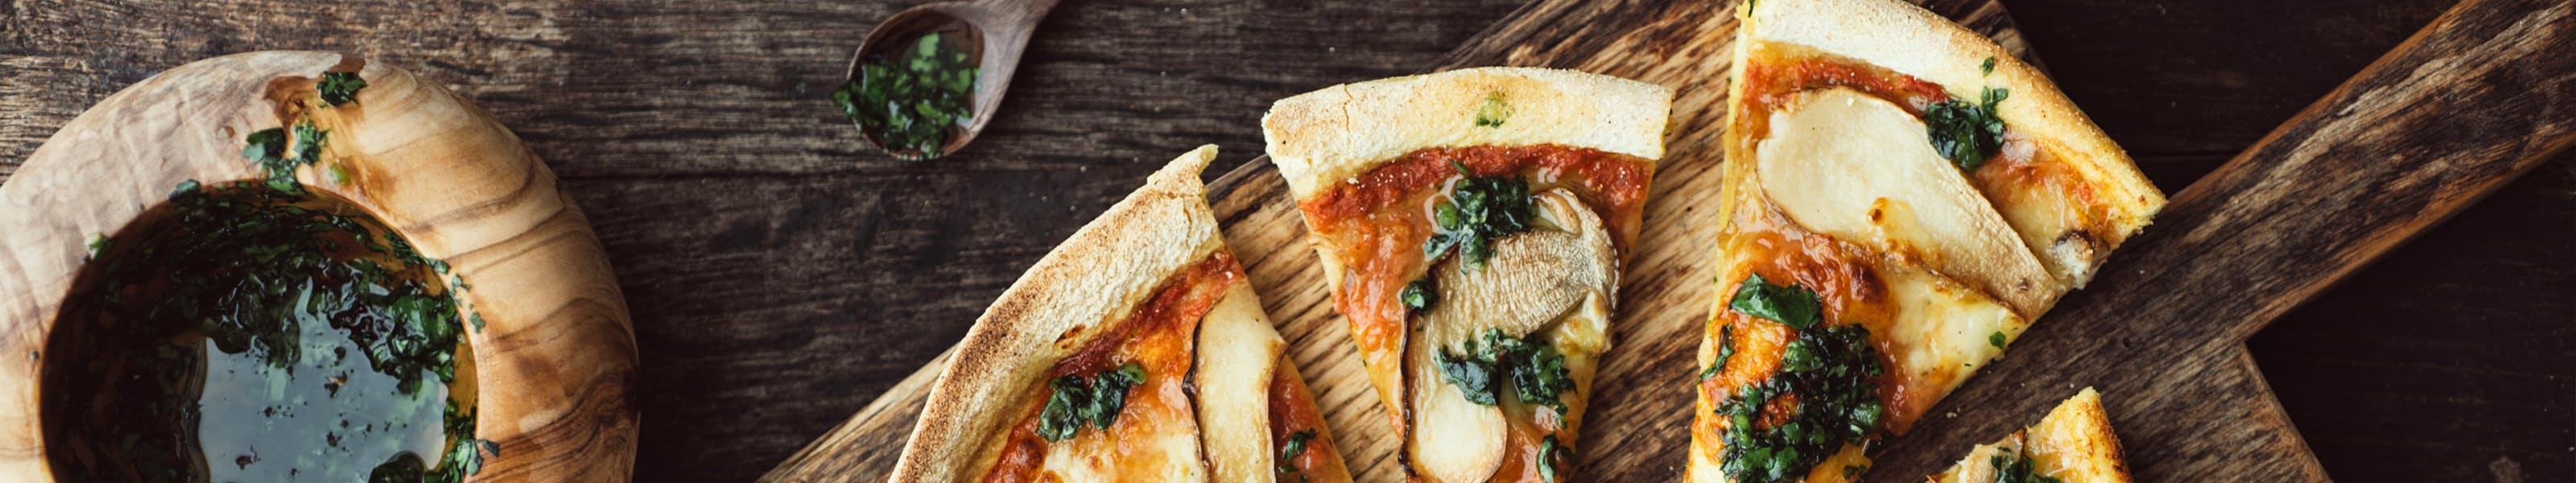 Pizzacraft header.jpg?ixlib=rails 2.1